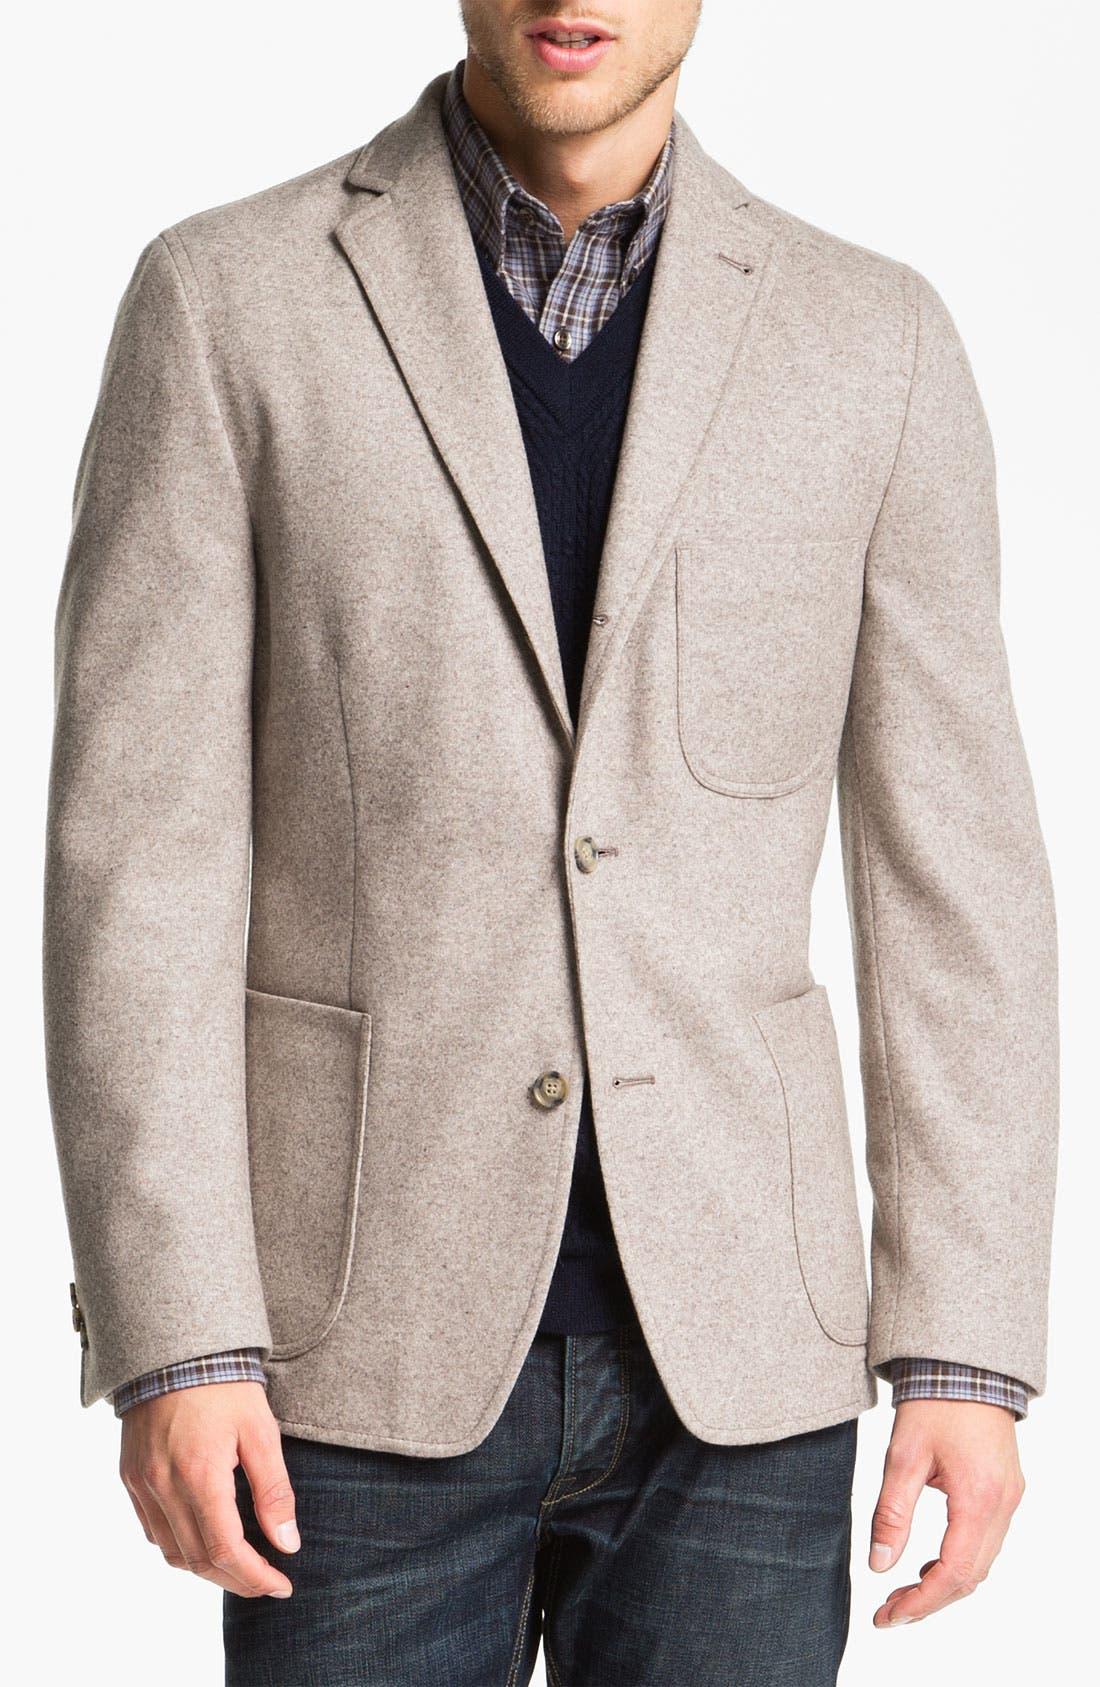 Main Image - Kroon 'Mayer' Wool & Cashmere Blend Knit Sportcoat